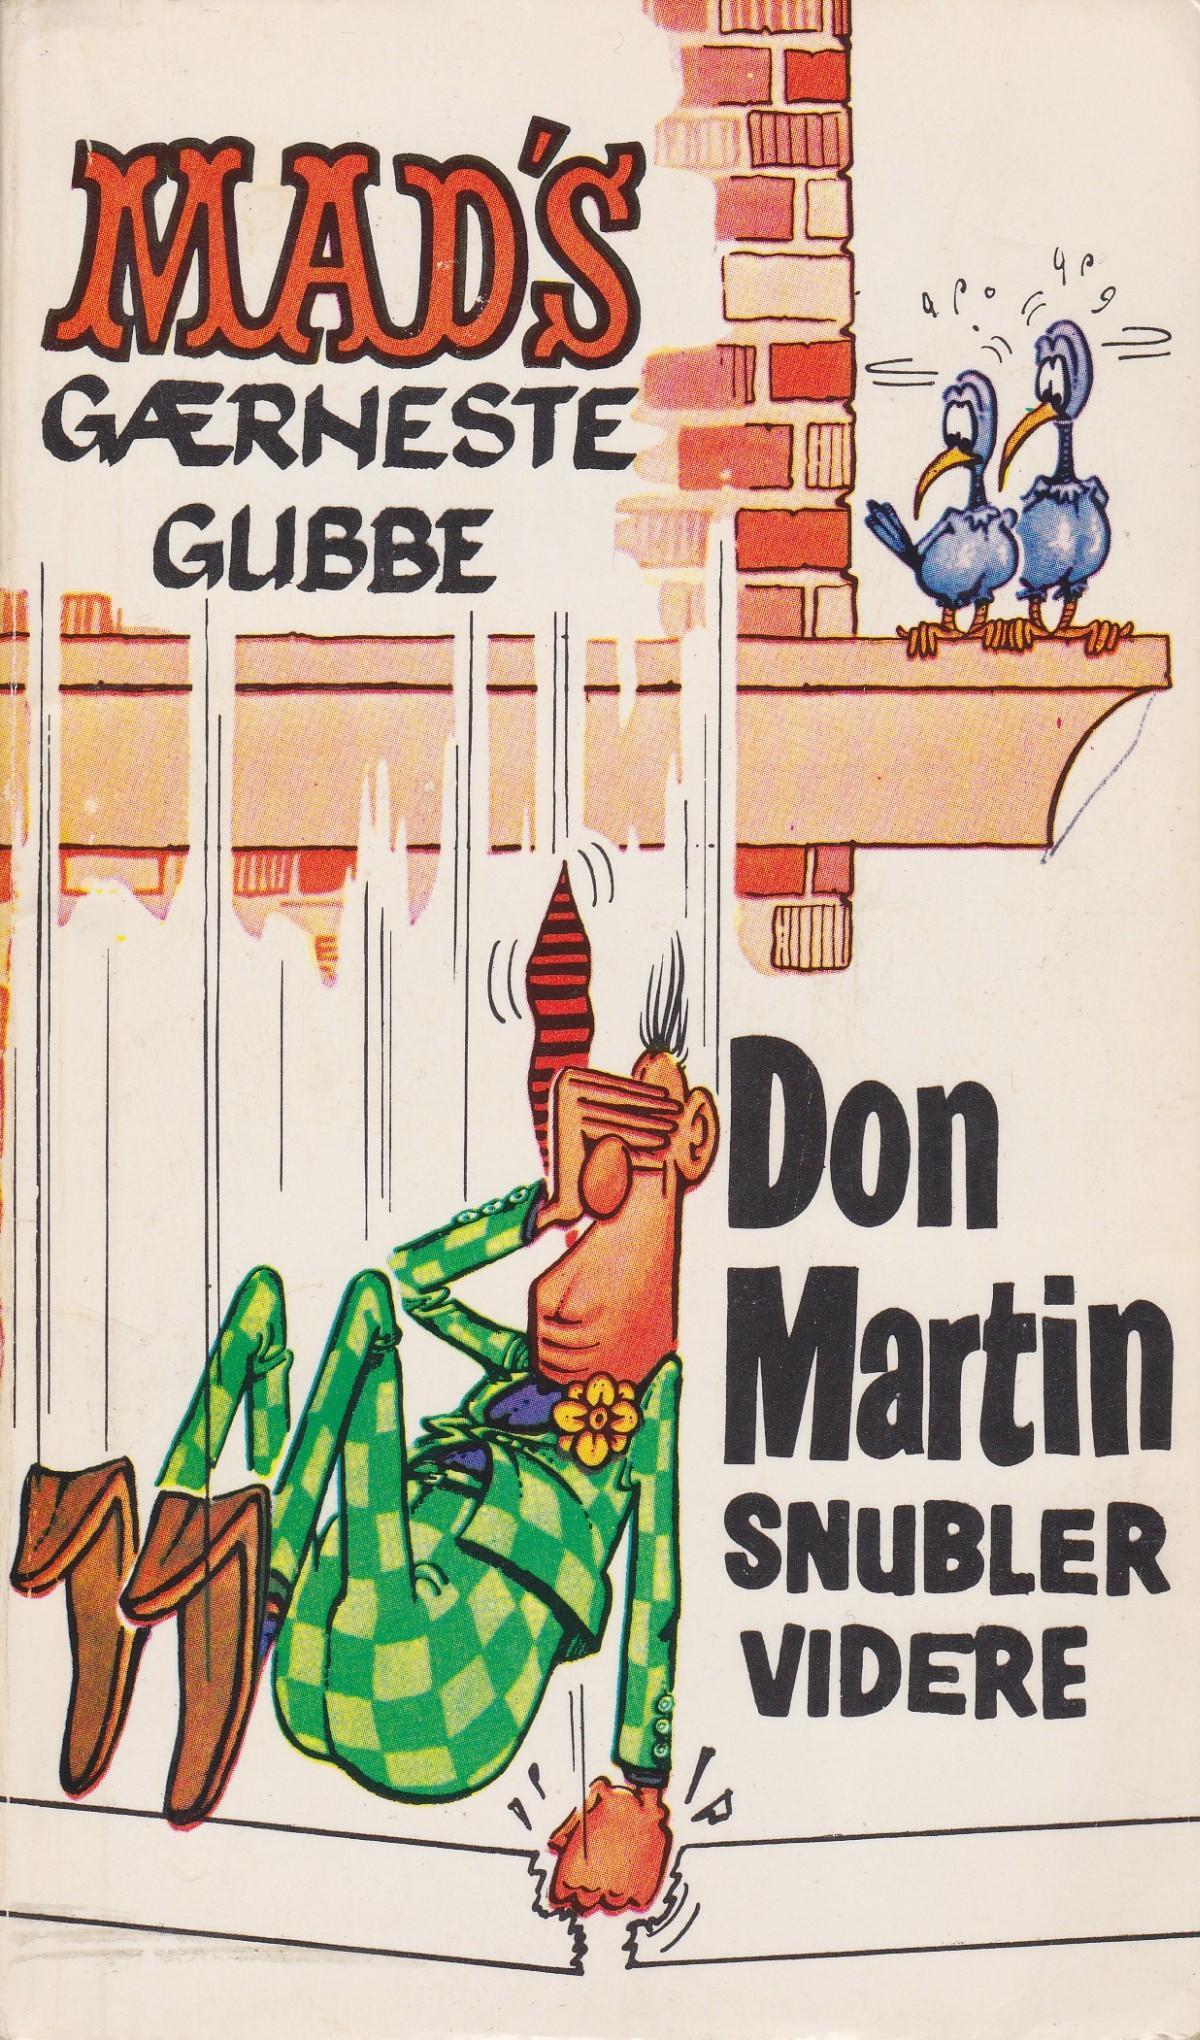 Mad's gærneste gubbe Don Martin snubler videre #2 • Norway • 1st Edition - Williams